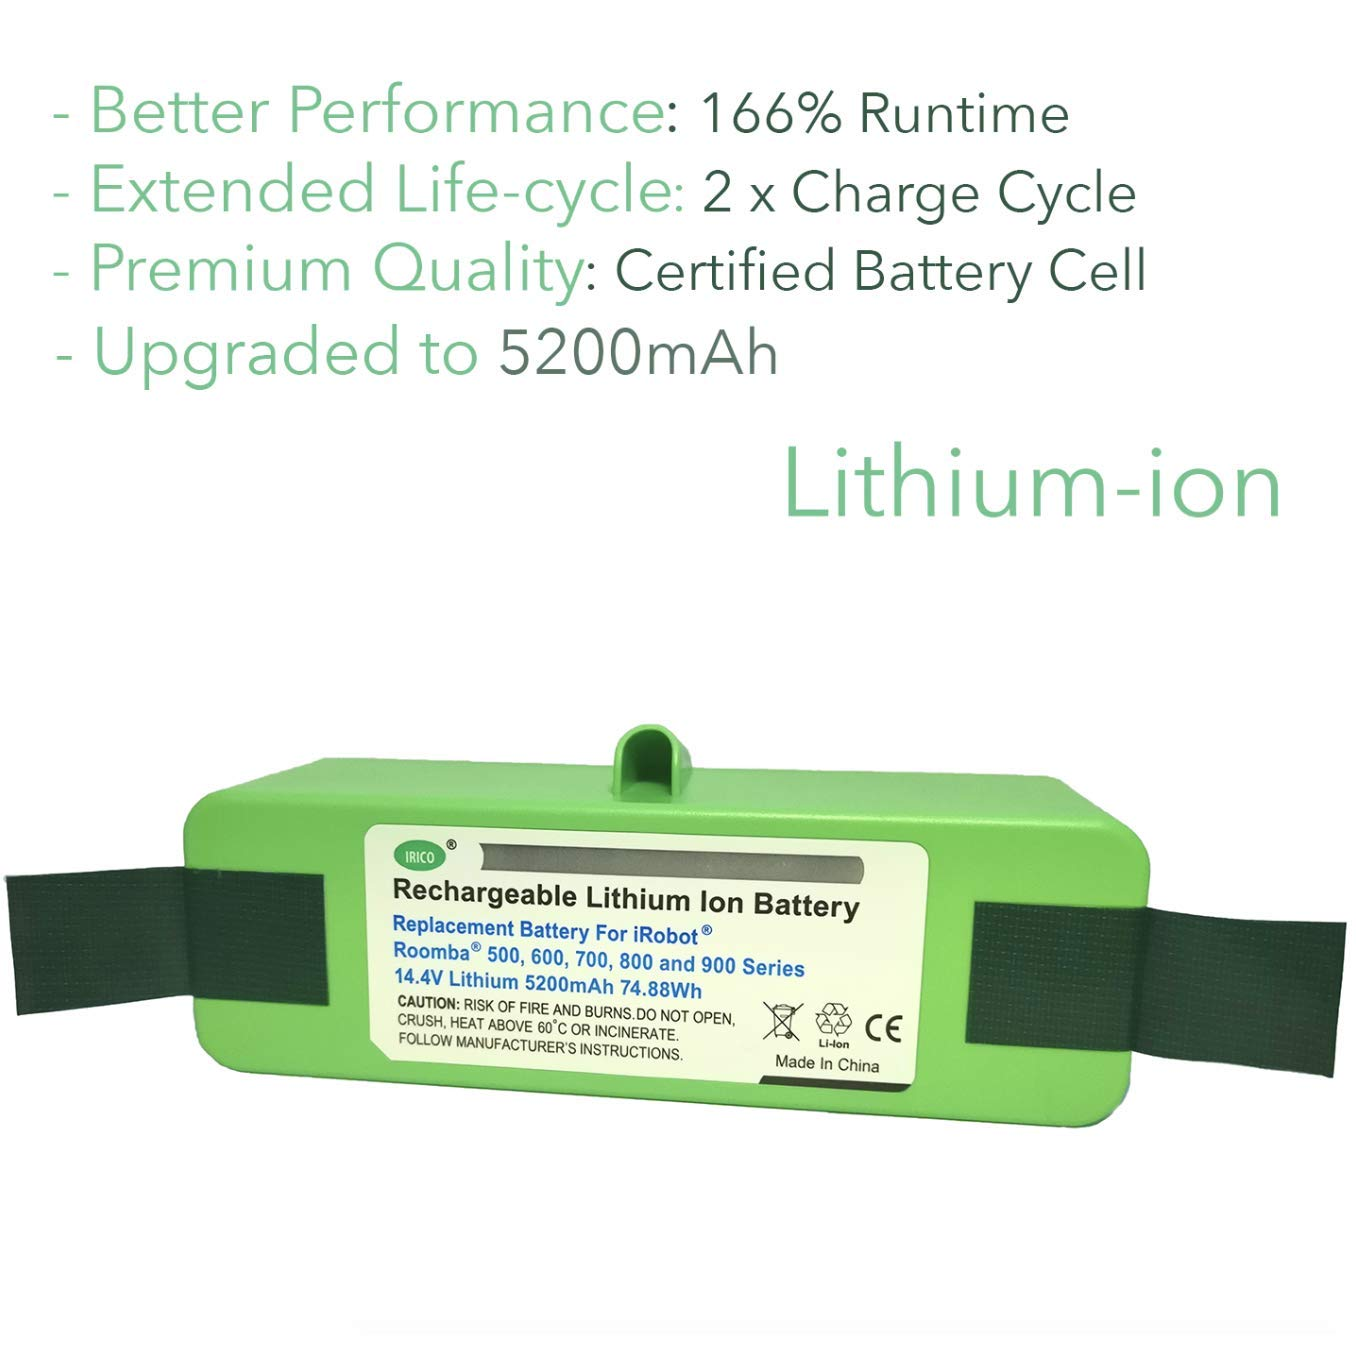 IRICO iRobot Roomba Replacement Battery Lithium 5200mAh for Roomba 500 600 700 800 900 Series | iRobot Roomba Battery Replacement 980 960 890 880 870 860 850 805 790 780 770 690 655 650 645 595 580 by IRICO